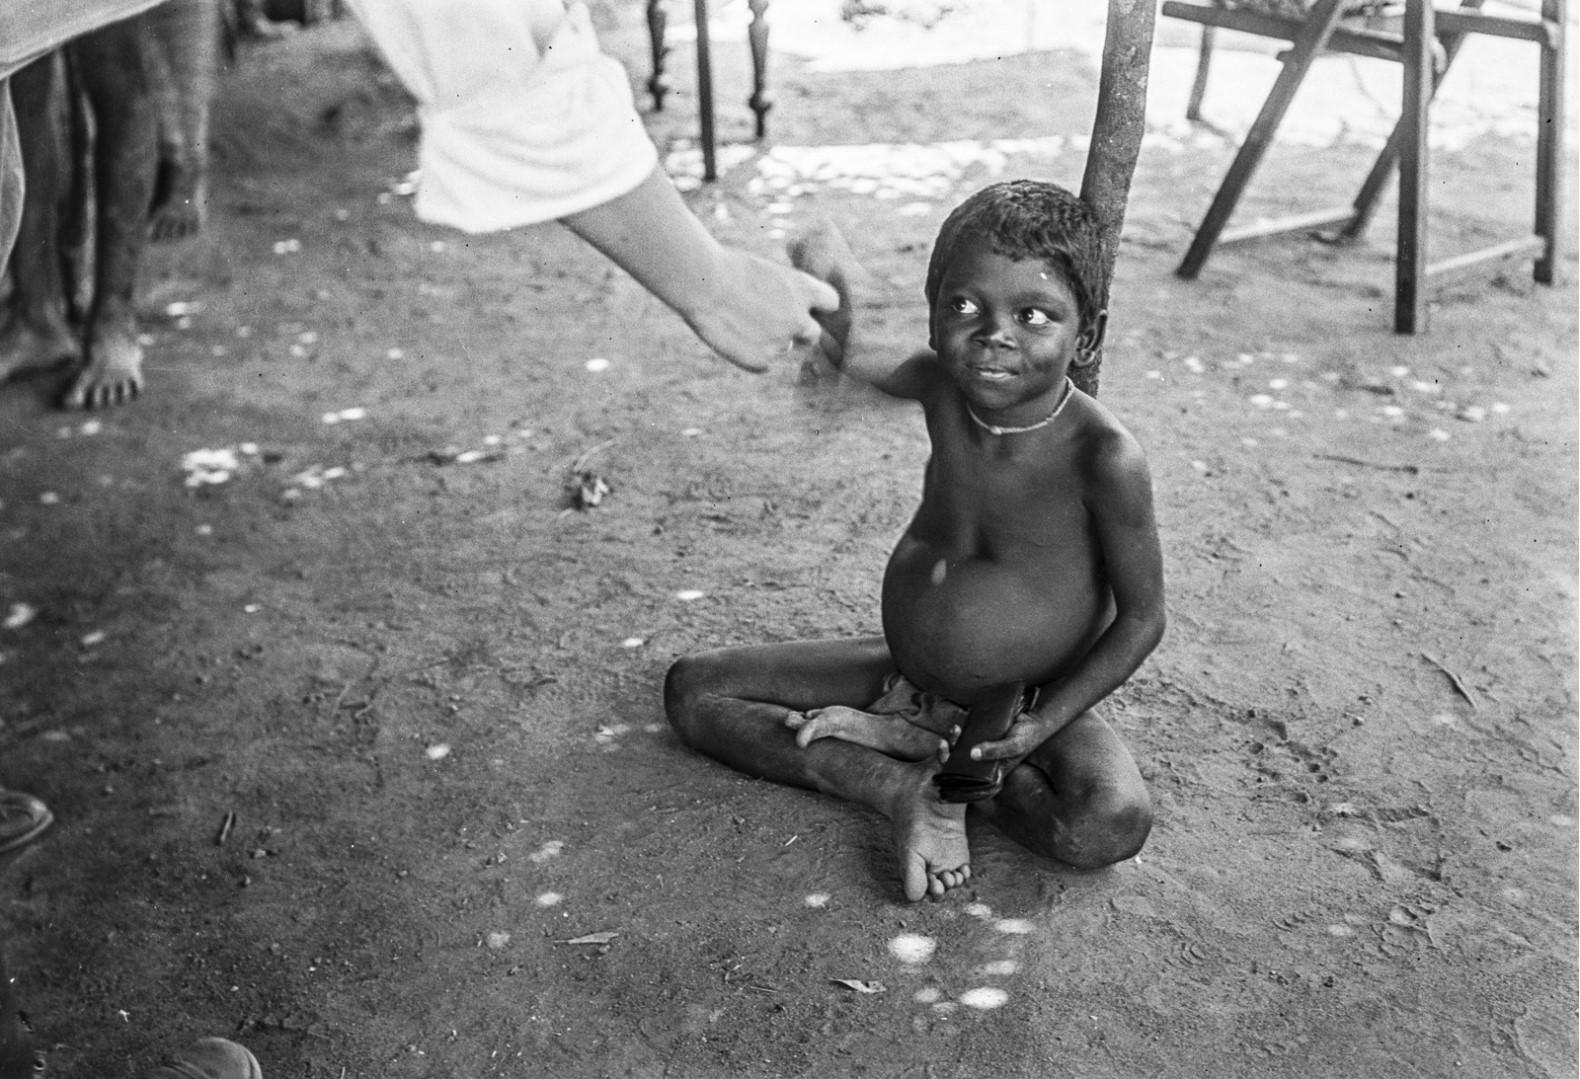 401. Мадугалла. Местного ребенка угощают бананом